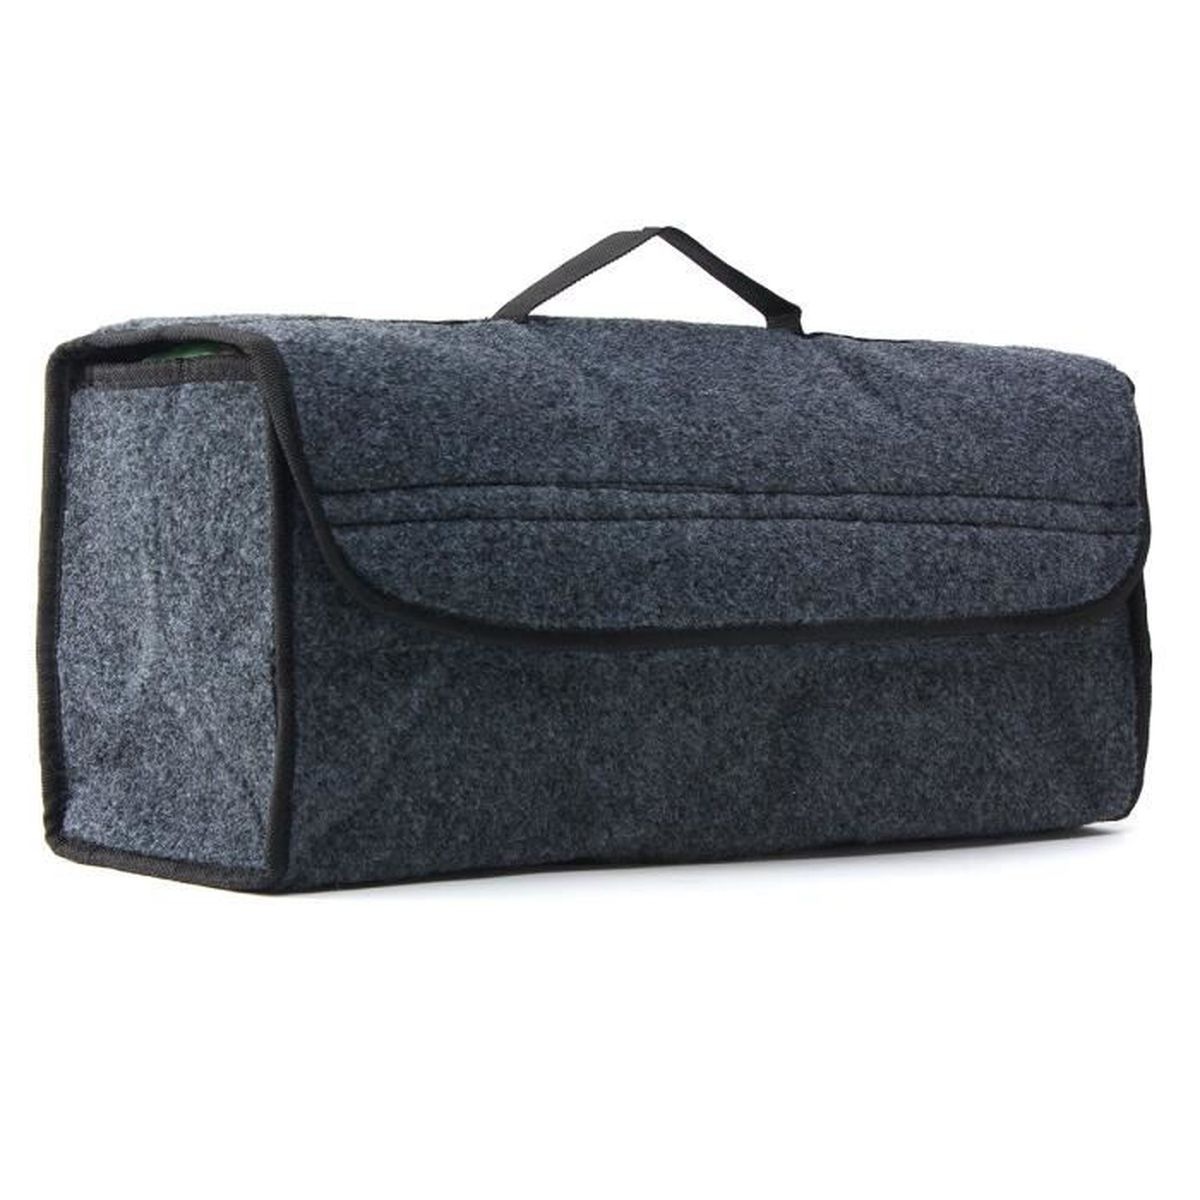 sac coffre voiture achat vente sac coffre voiture pas cher cdiscount. Black Bedroom Furniture Sets. Home Design Ideas